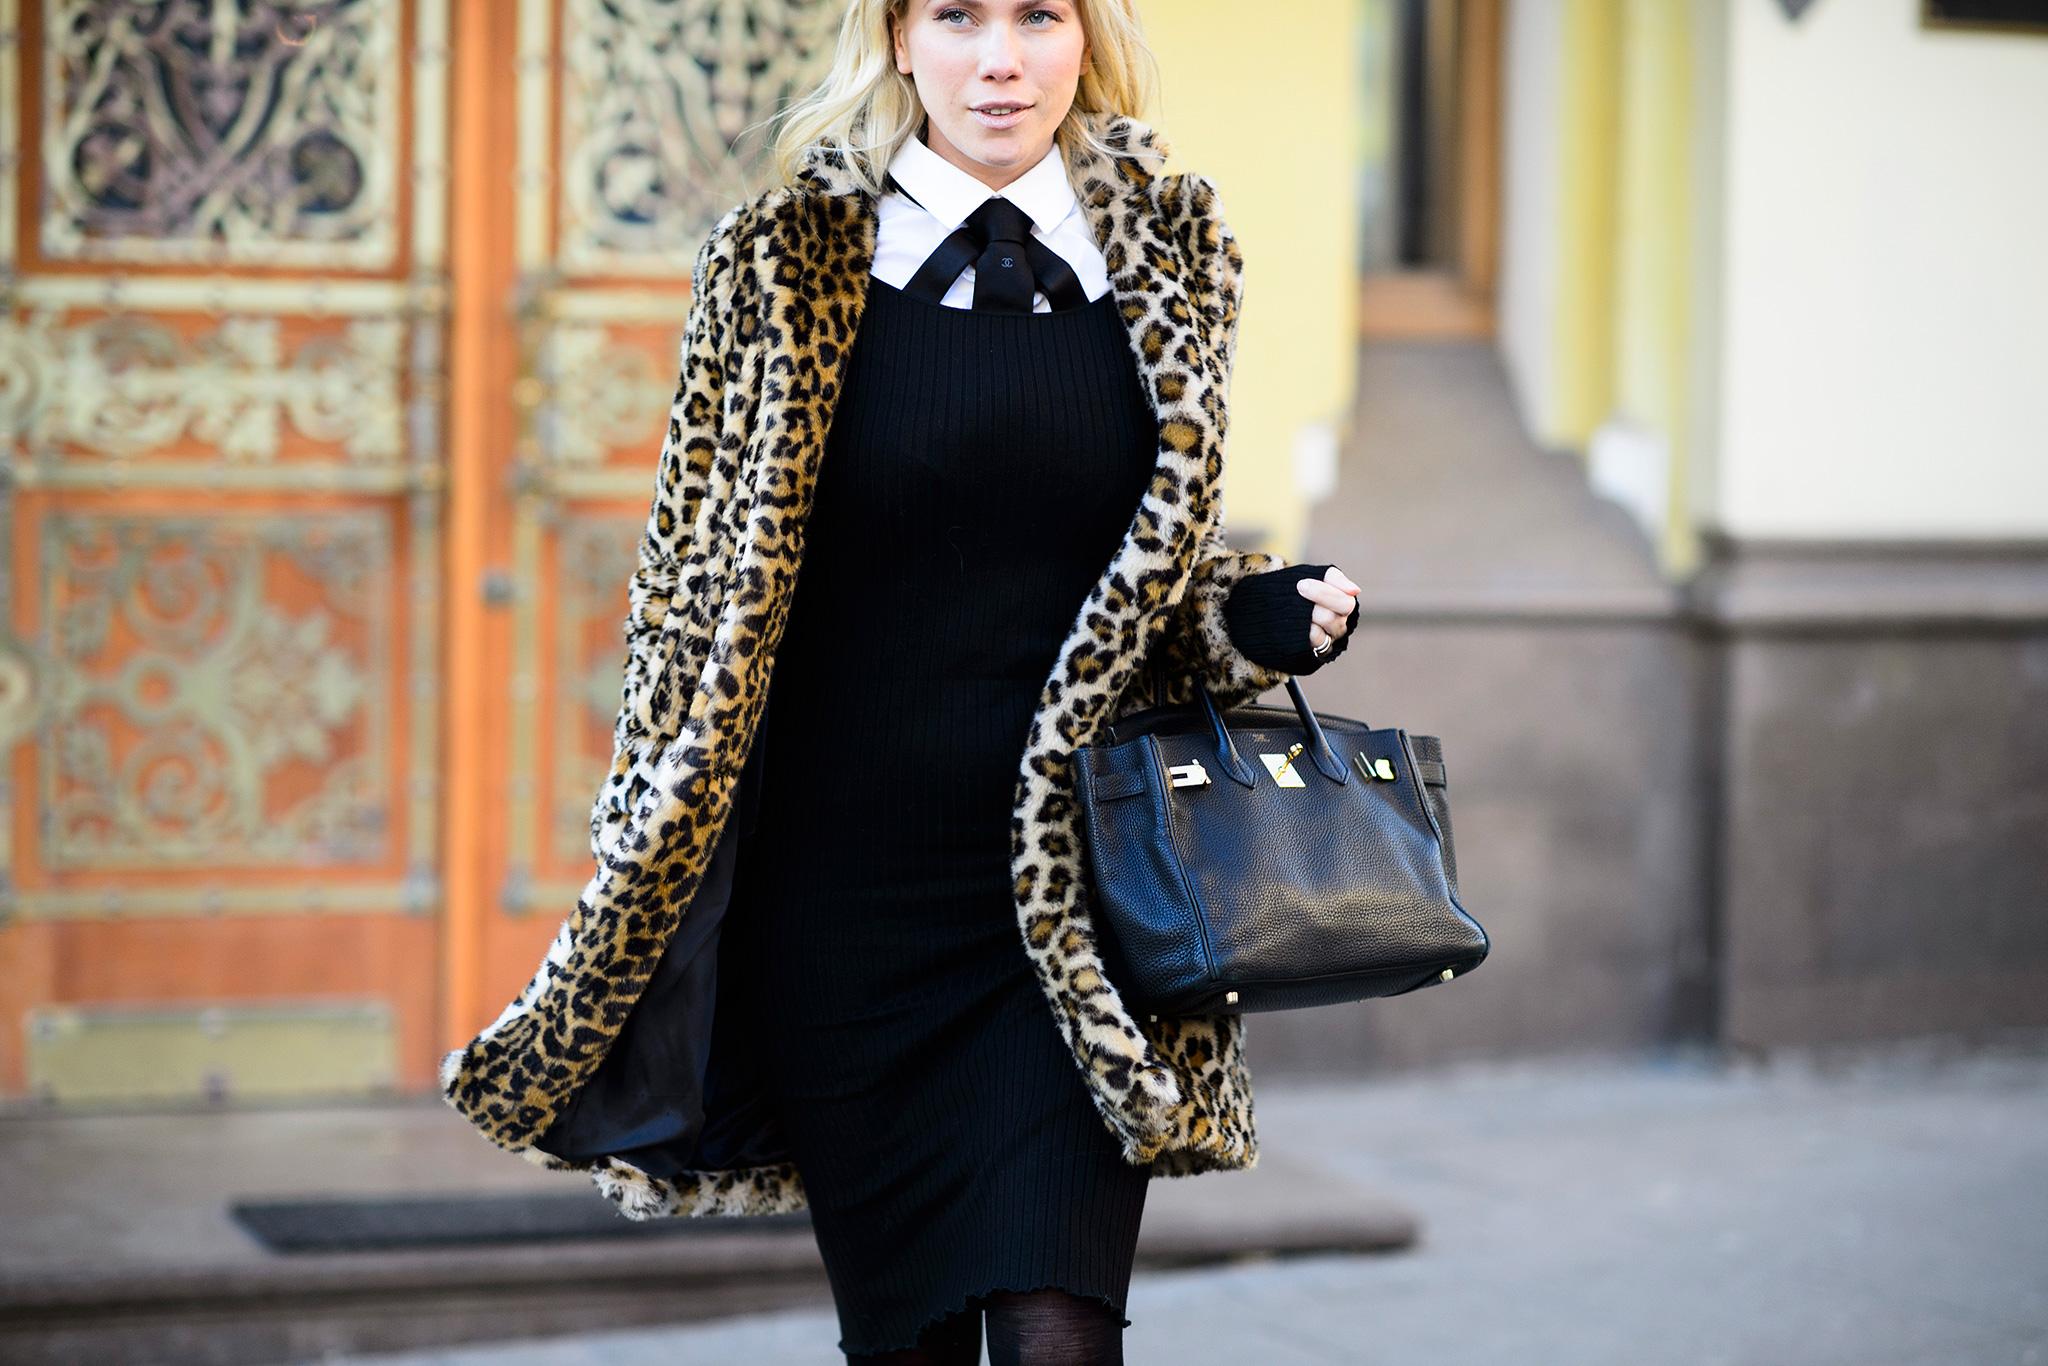 Street style - inverno 2015 imagem: via style